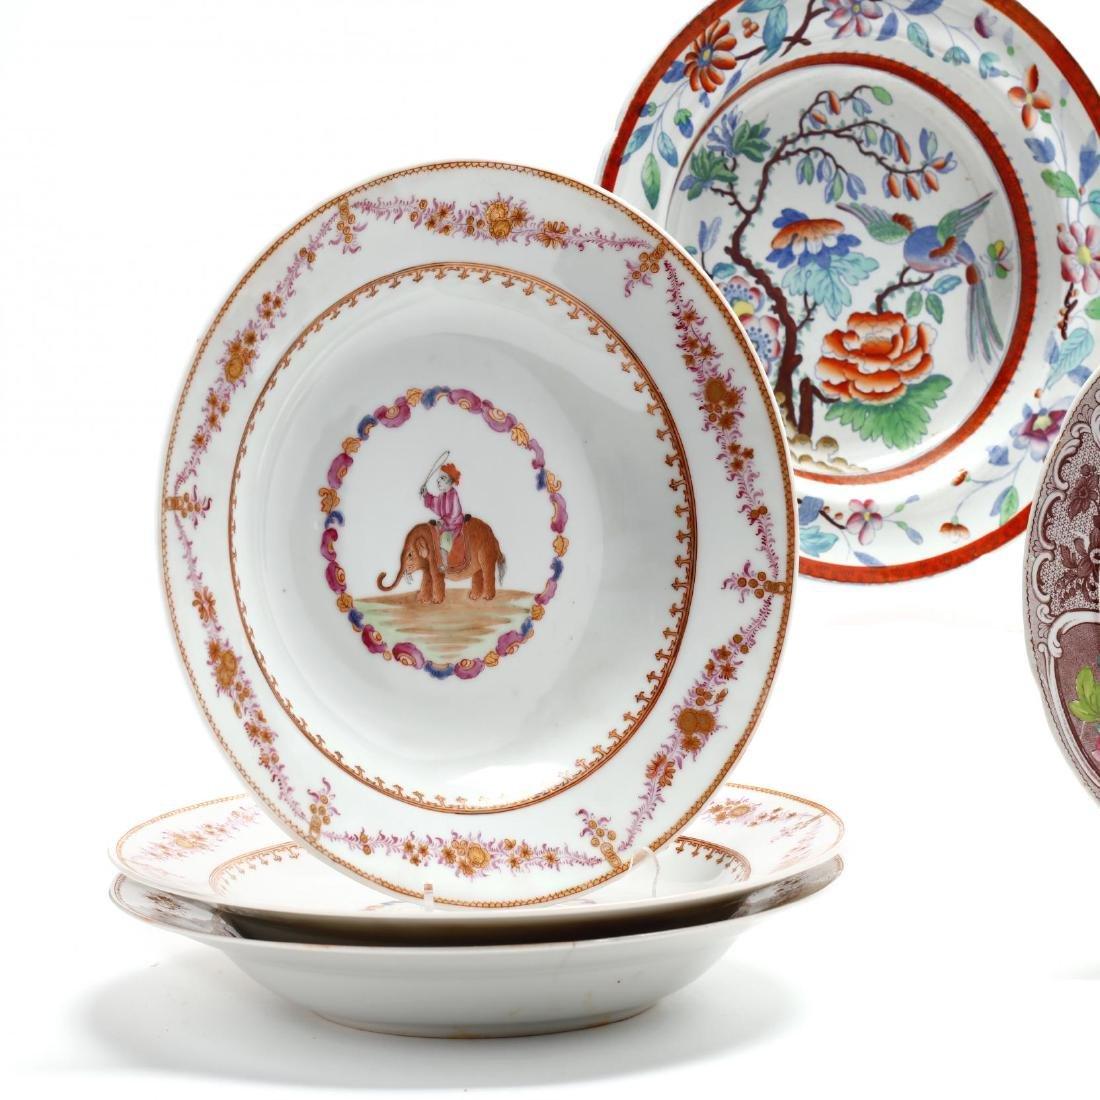 A Collection of Antique Soup Bowls - 2